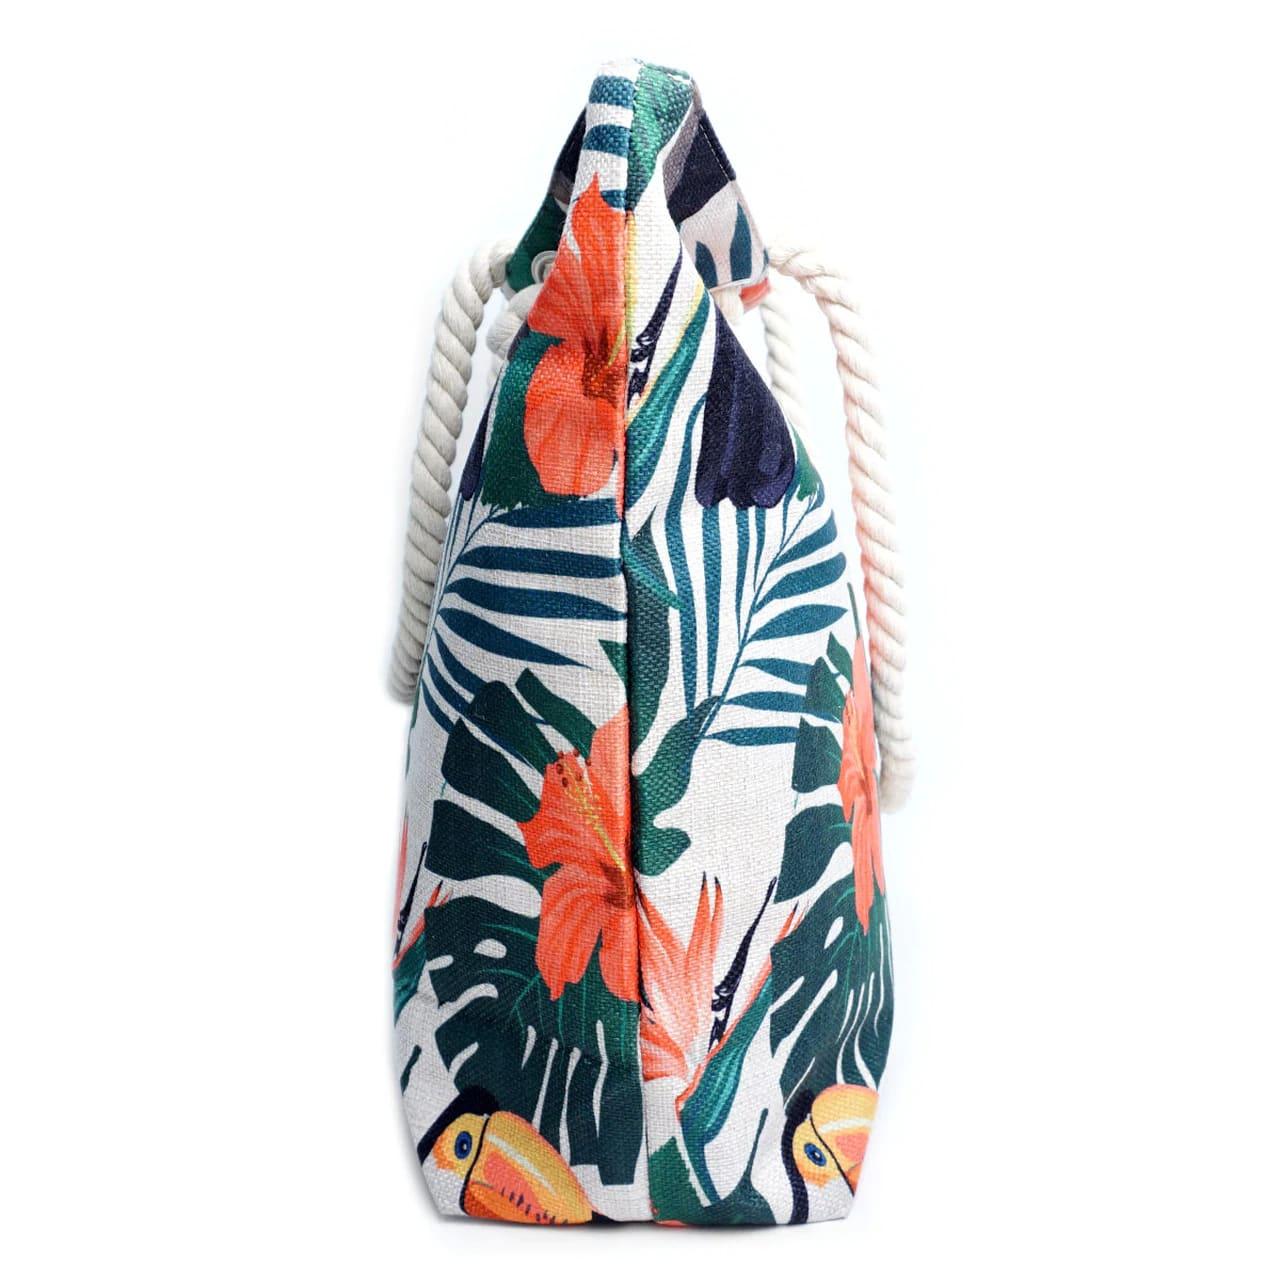 Toucan Tropical Tote Beach Bag - Light Beige - Back